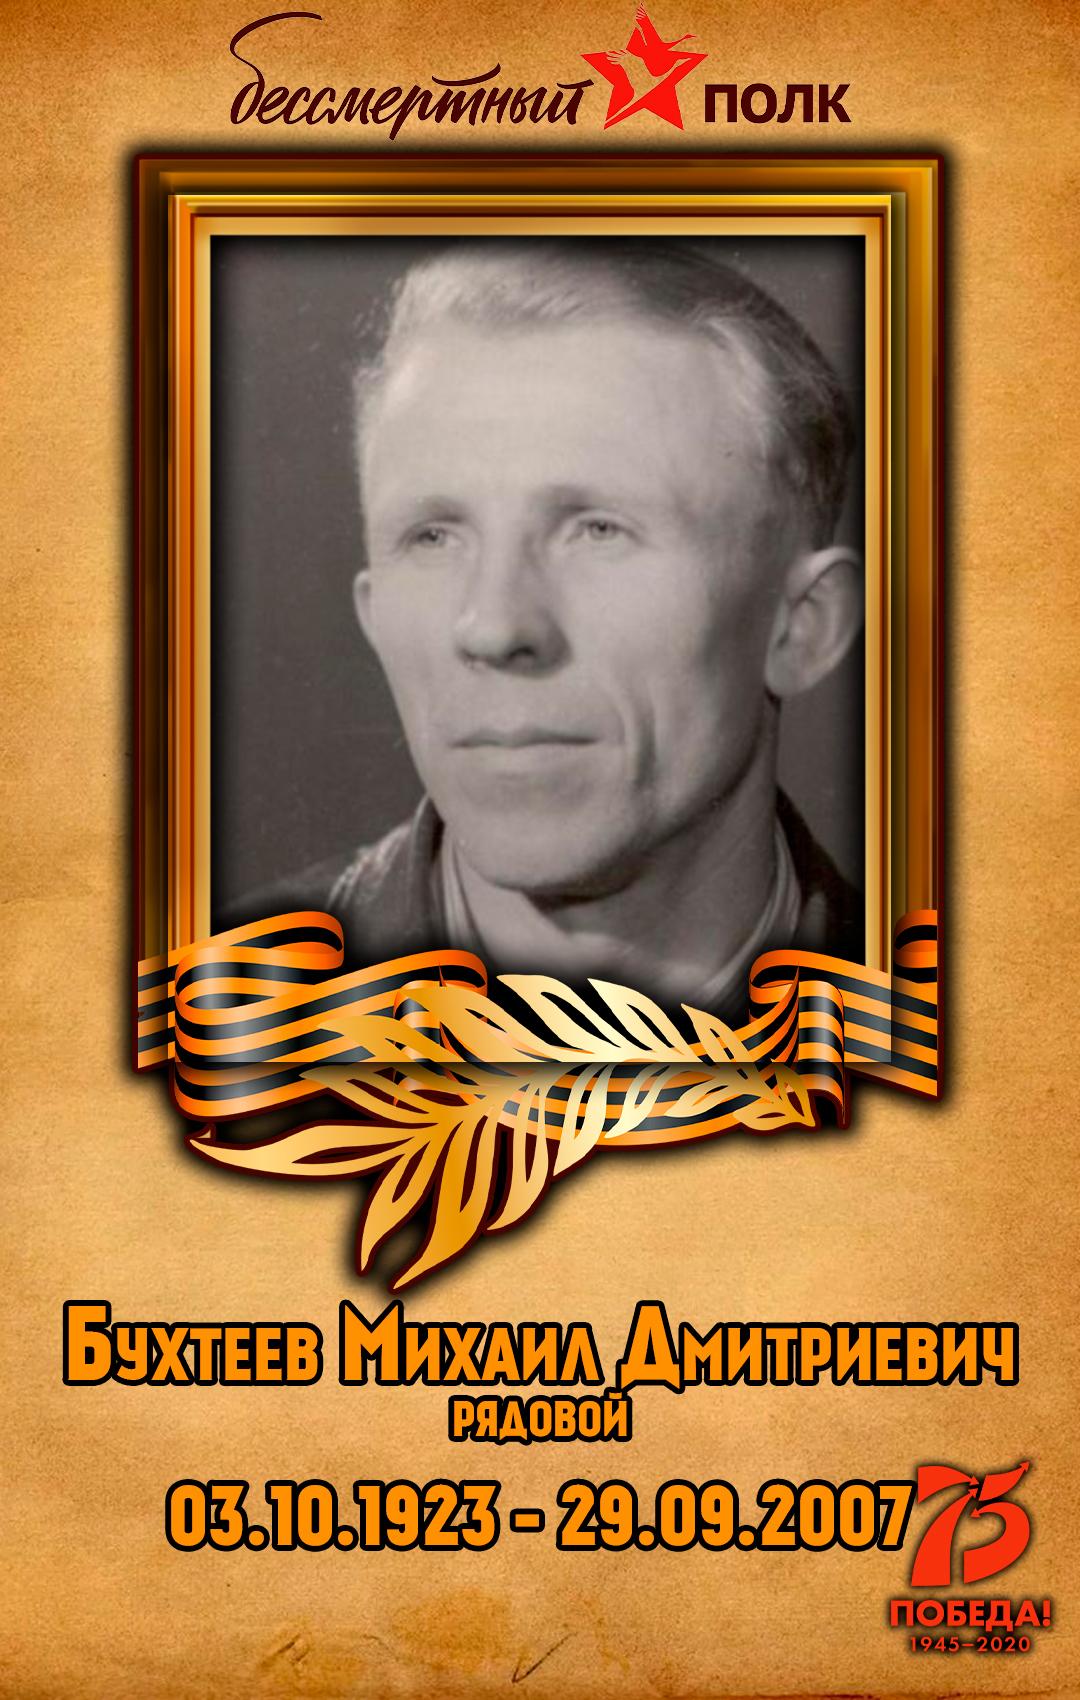 Бухтеев-Михаил-Дмитриевич